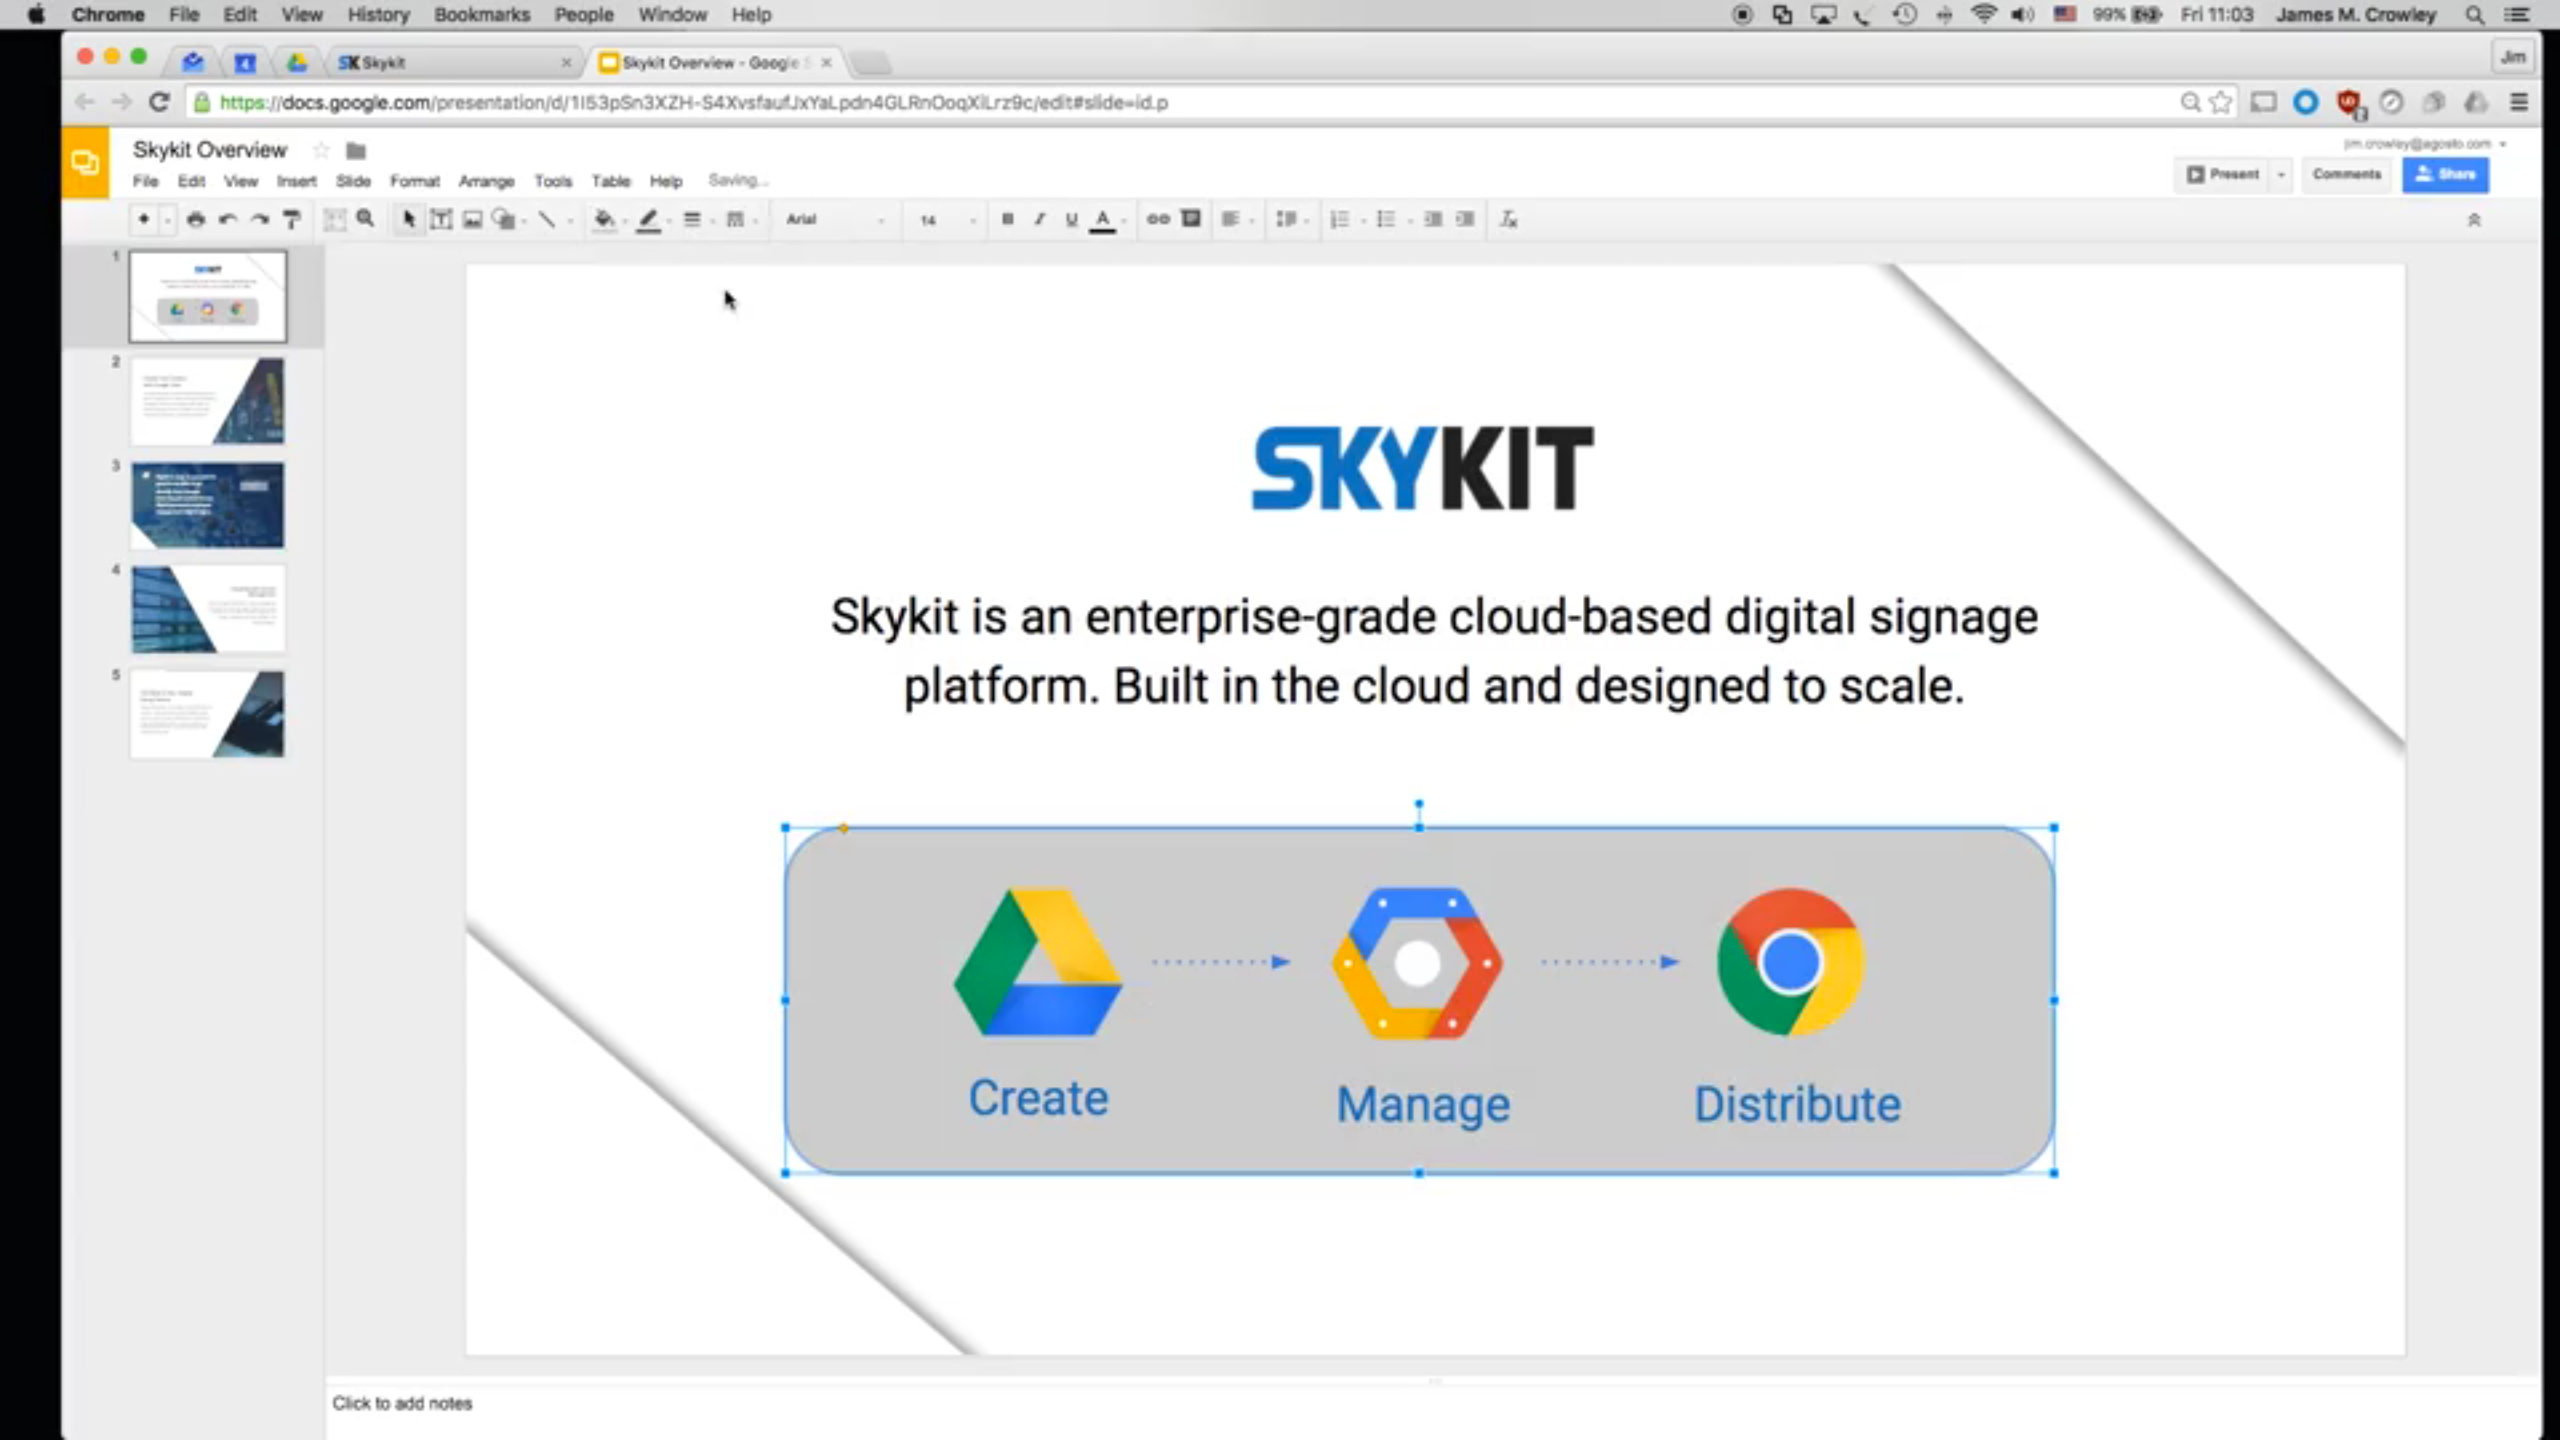 Individual presentation slides can be edited inline via seamless integration with Google Slides